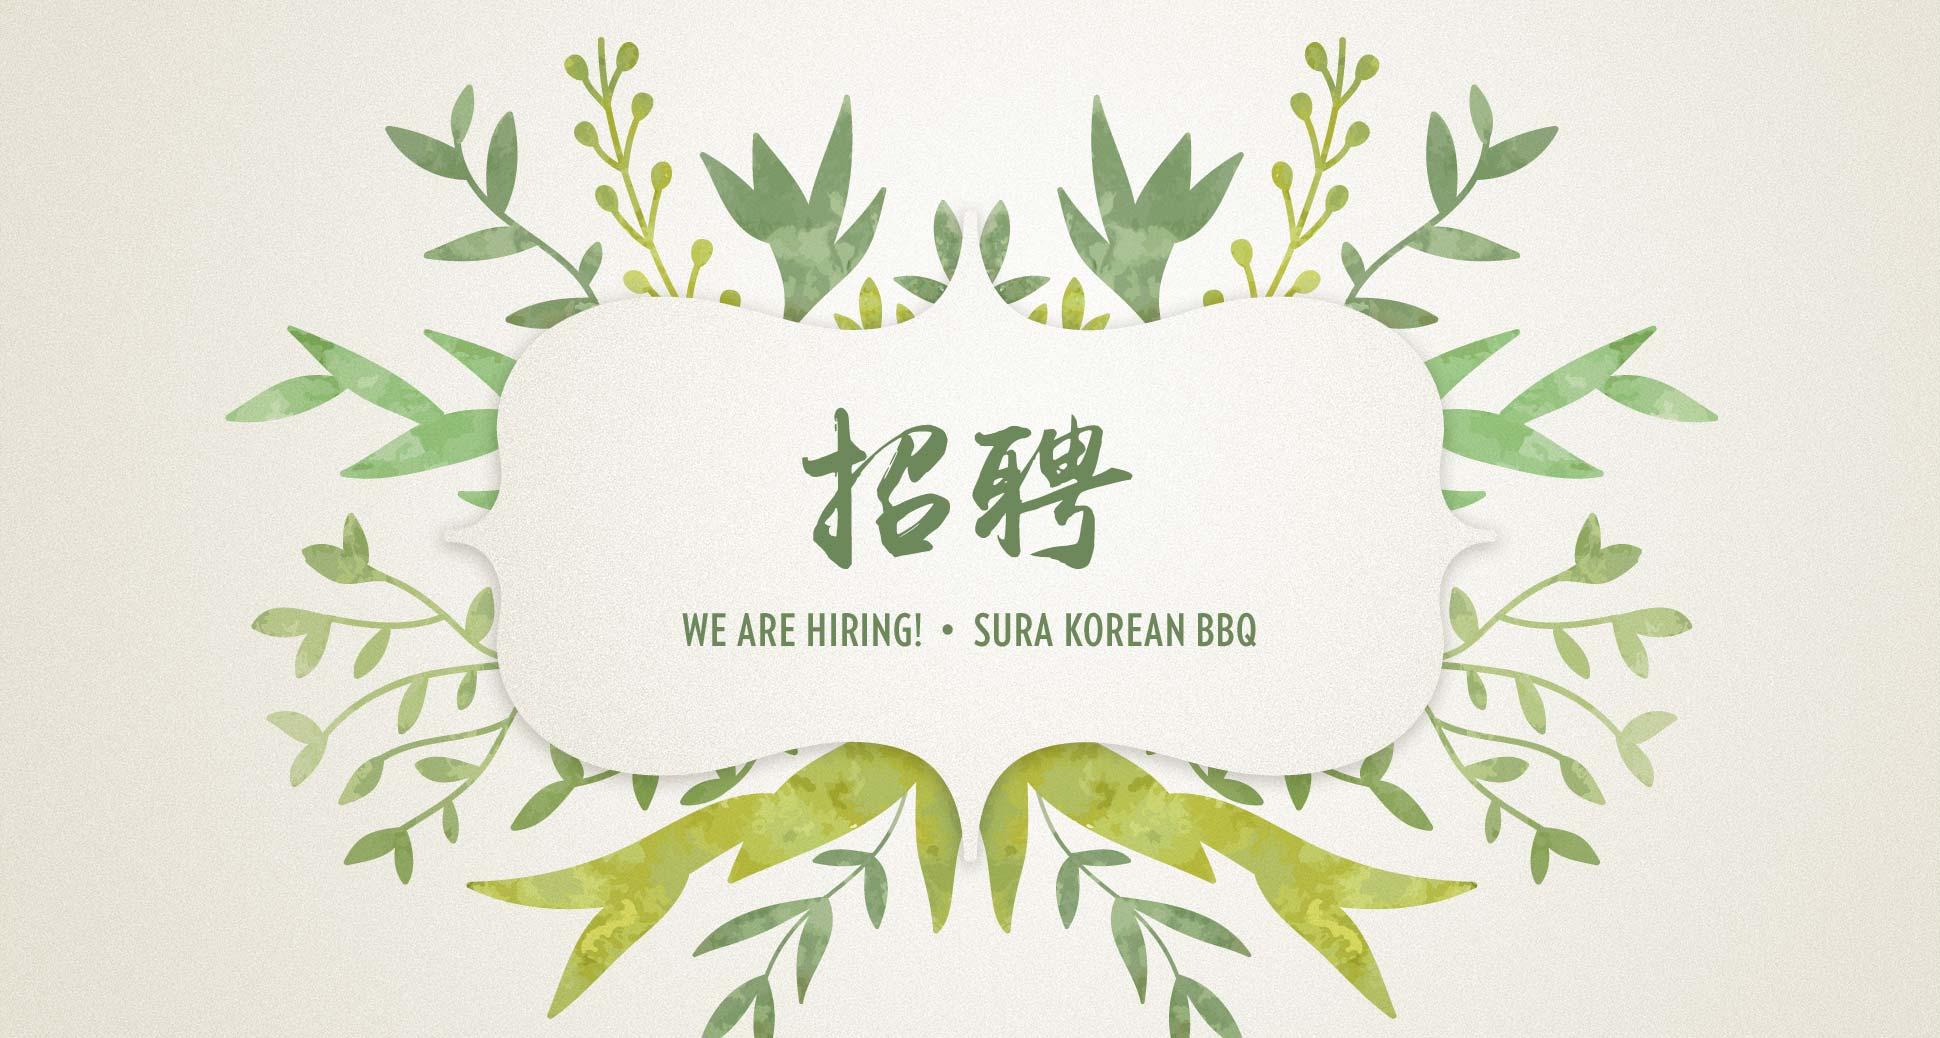 Sura korean bbq restaurant richmond is hiring!